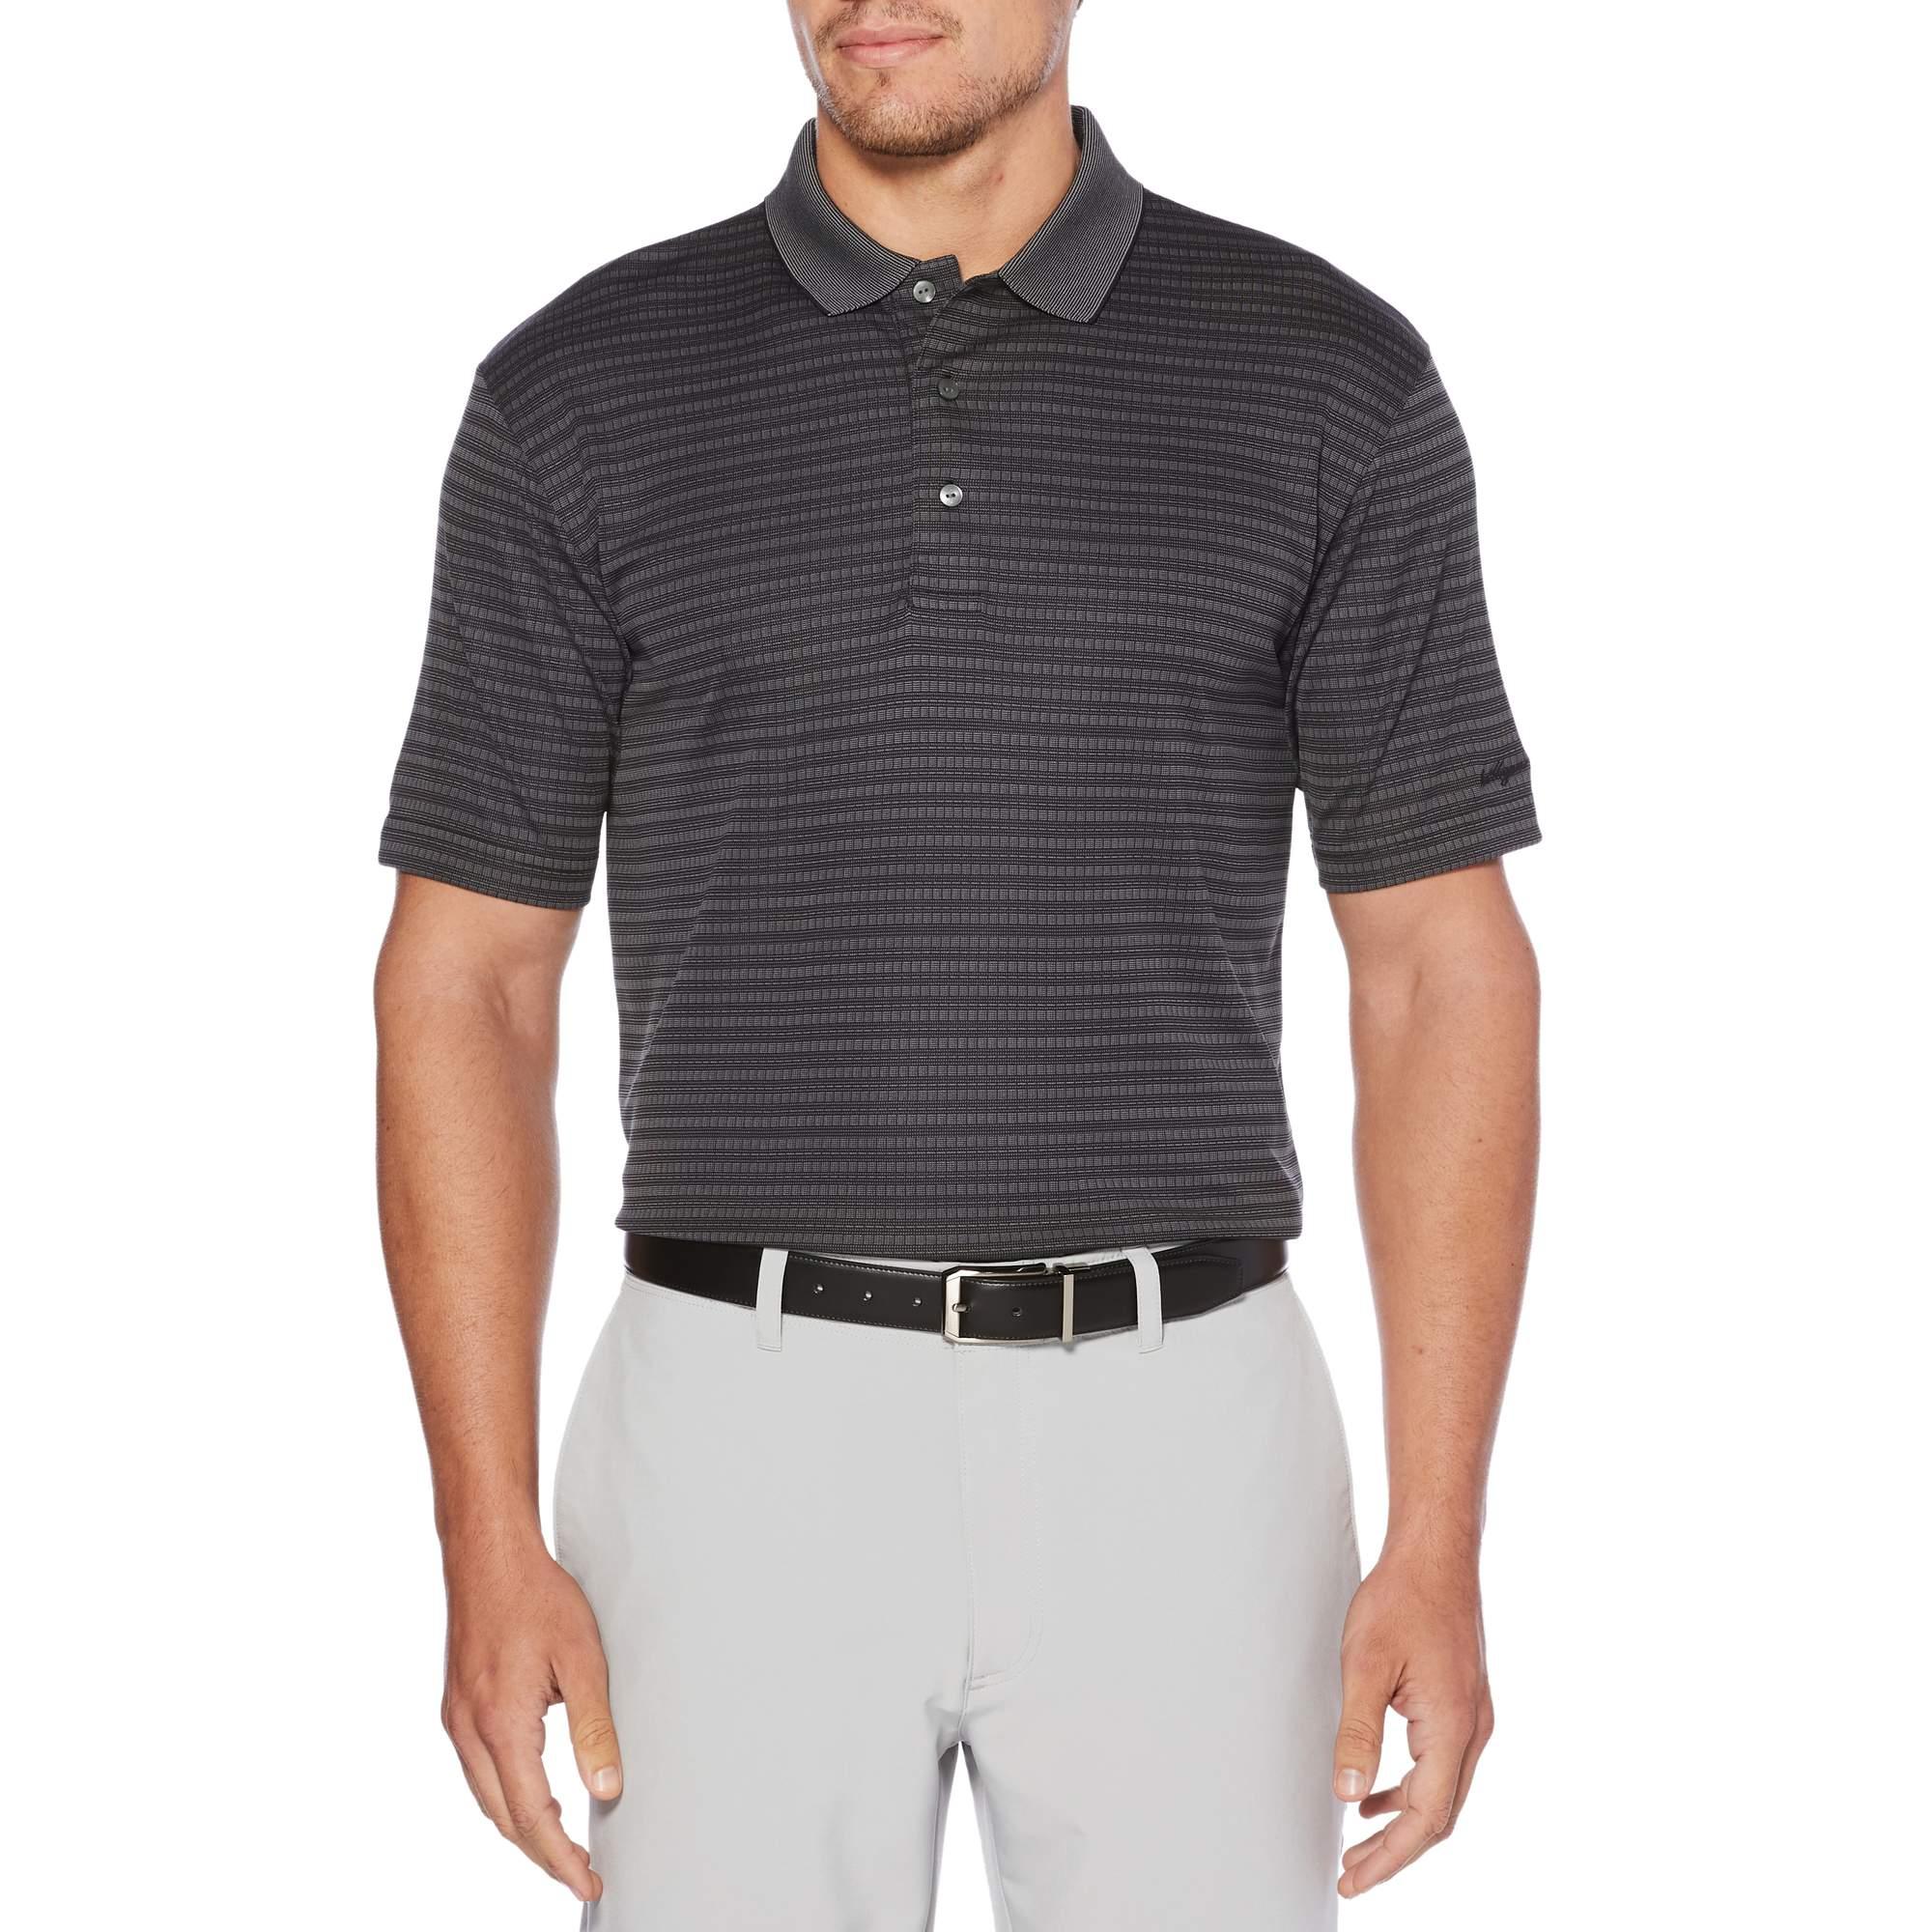 Big Men's Performance Short Sleeve Jacquard Golf Polo Shirt